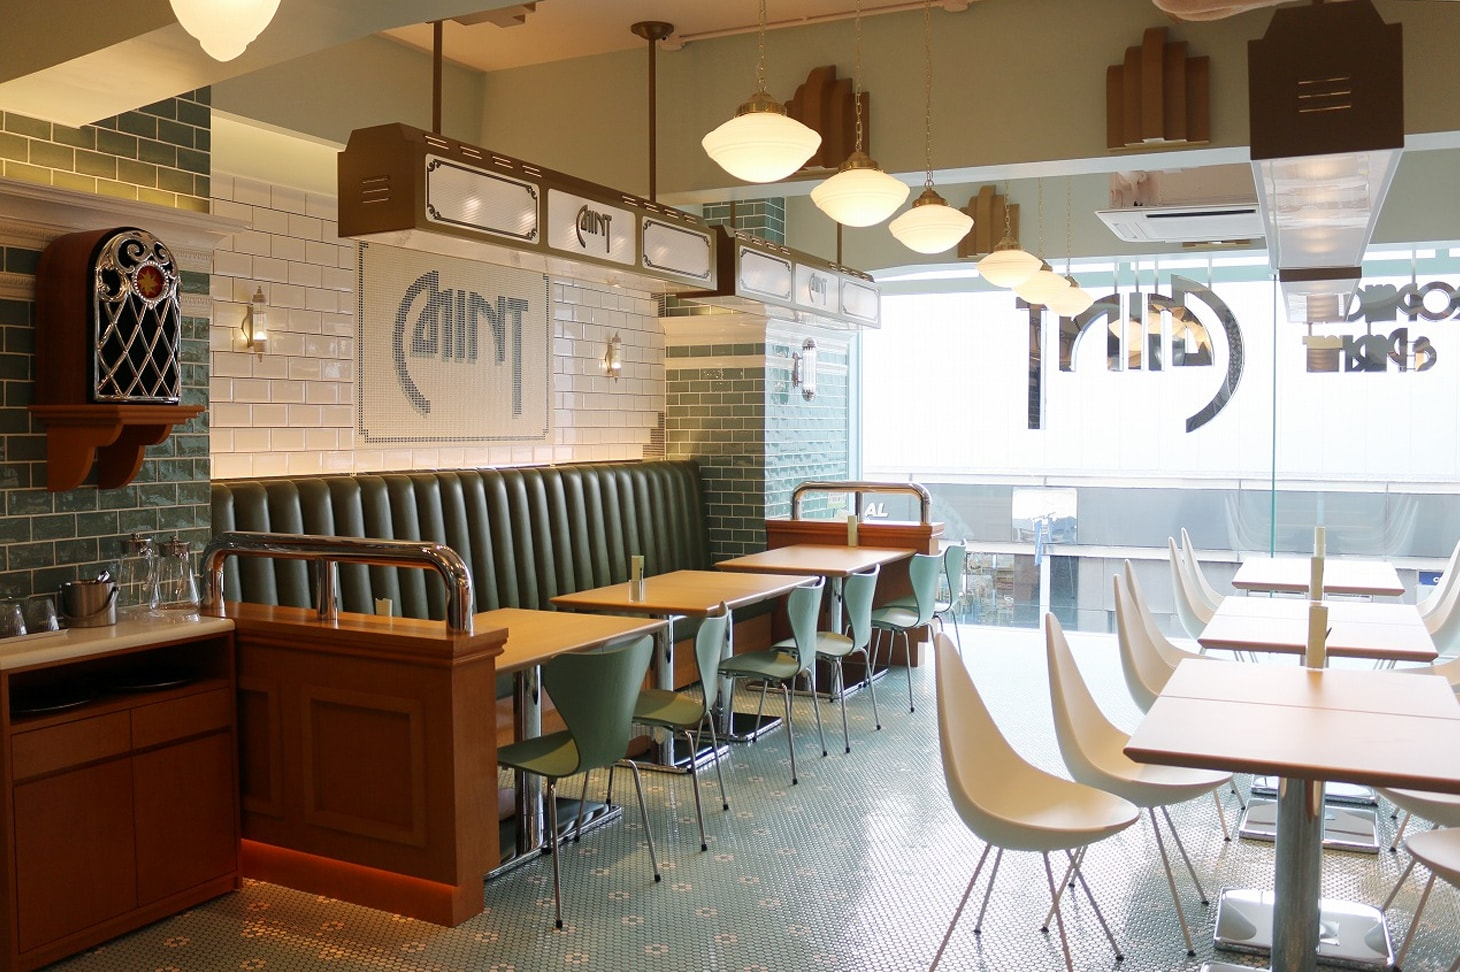 Sapporo Pancake & Parfait Last - グリーンを基調とした店内